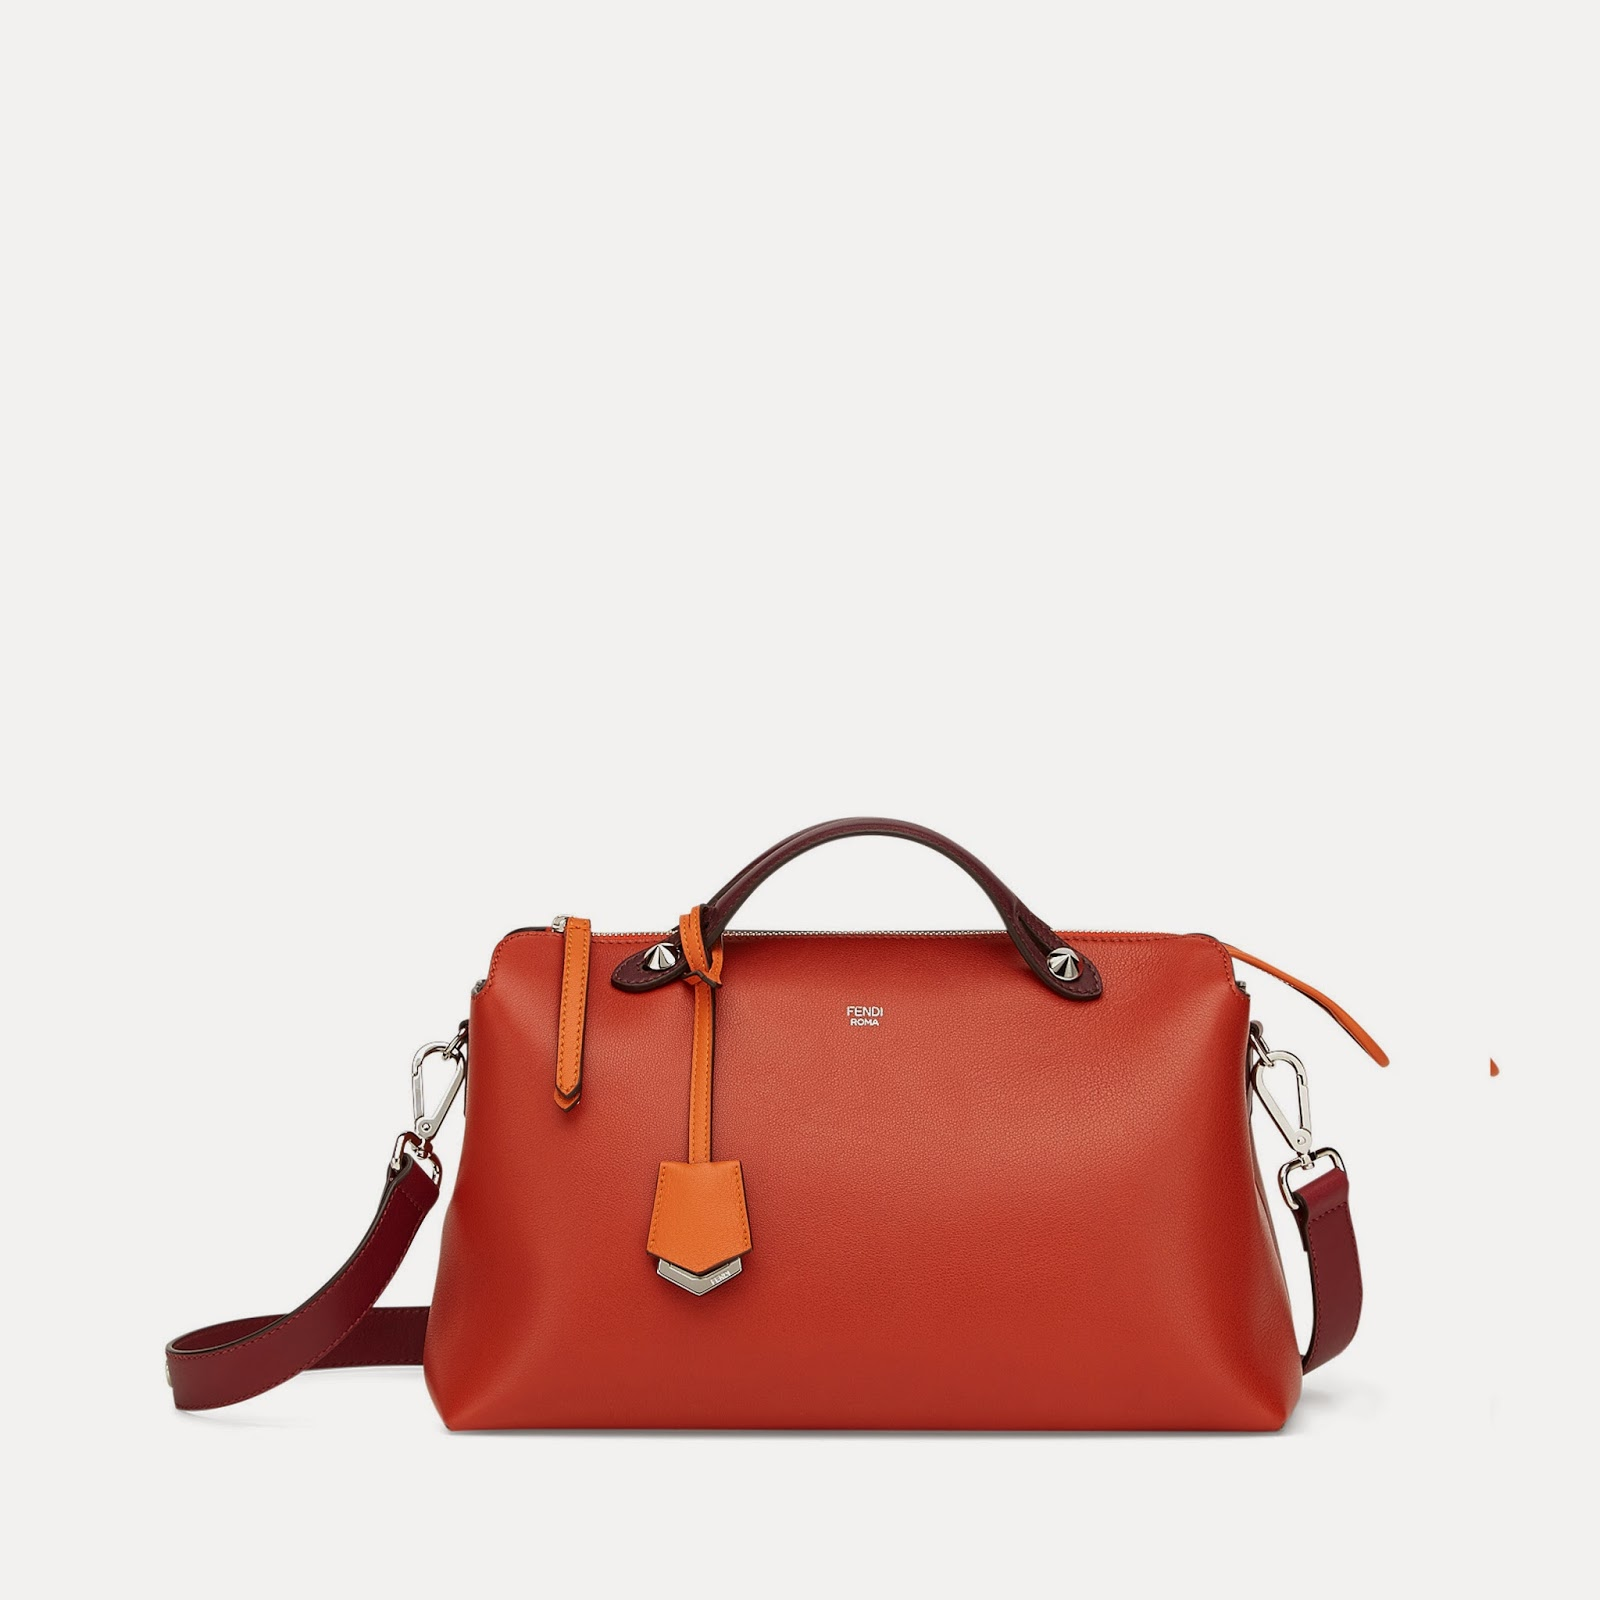 fendi+by+the+way+bag